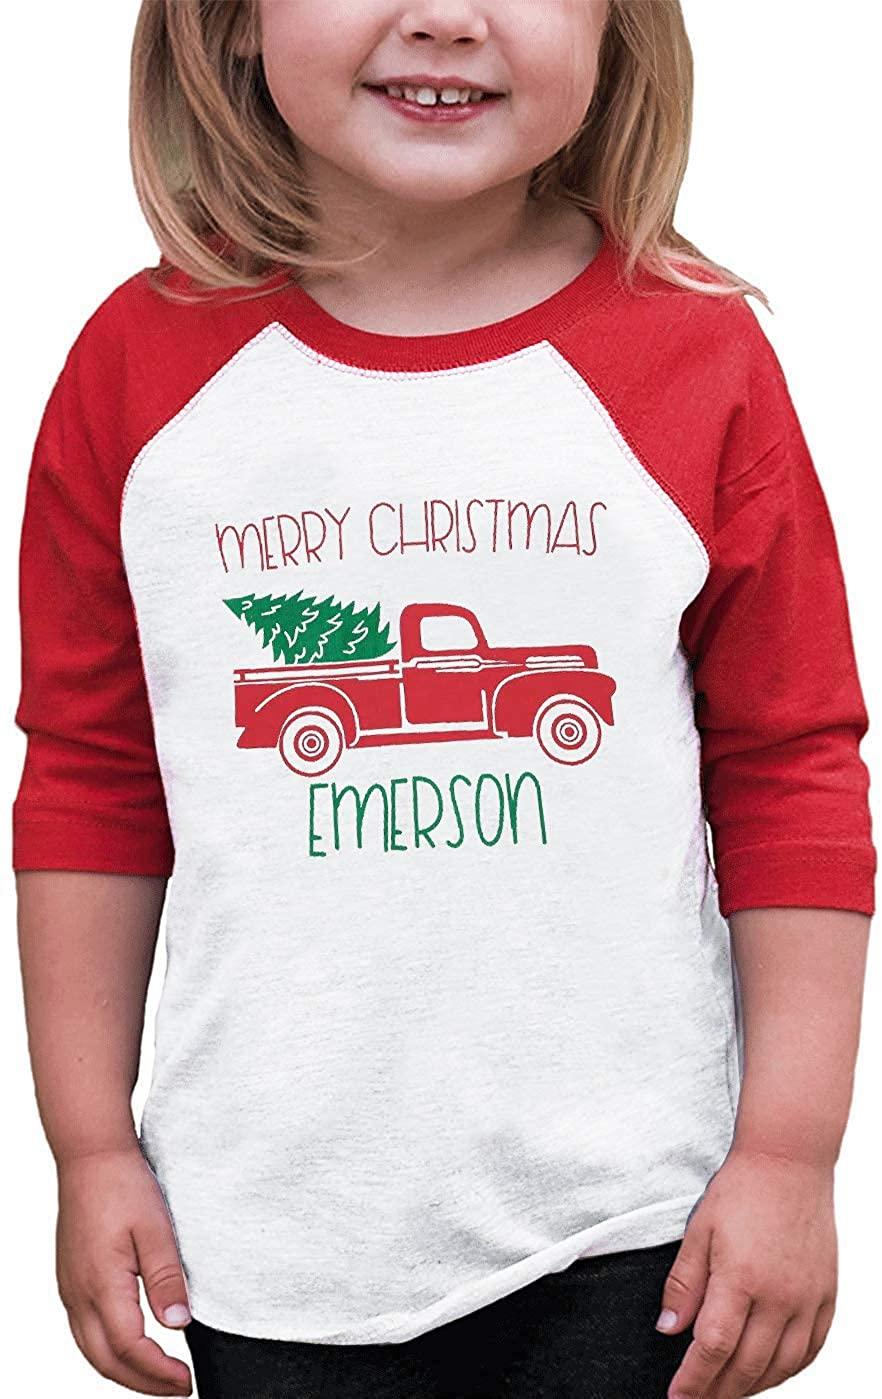 Toddler Baby Boy Girl Merry Christmas Emerson Tshirt Christams Truck Tree Tee Tops Cute Raglan Sleeve Shirts